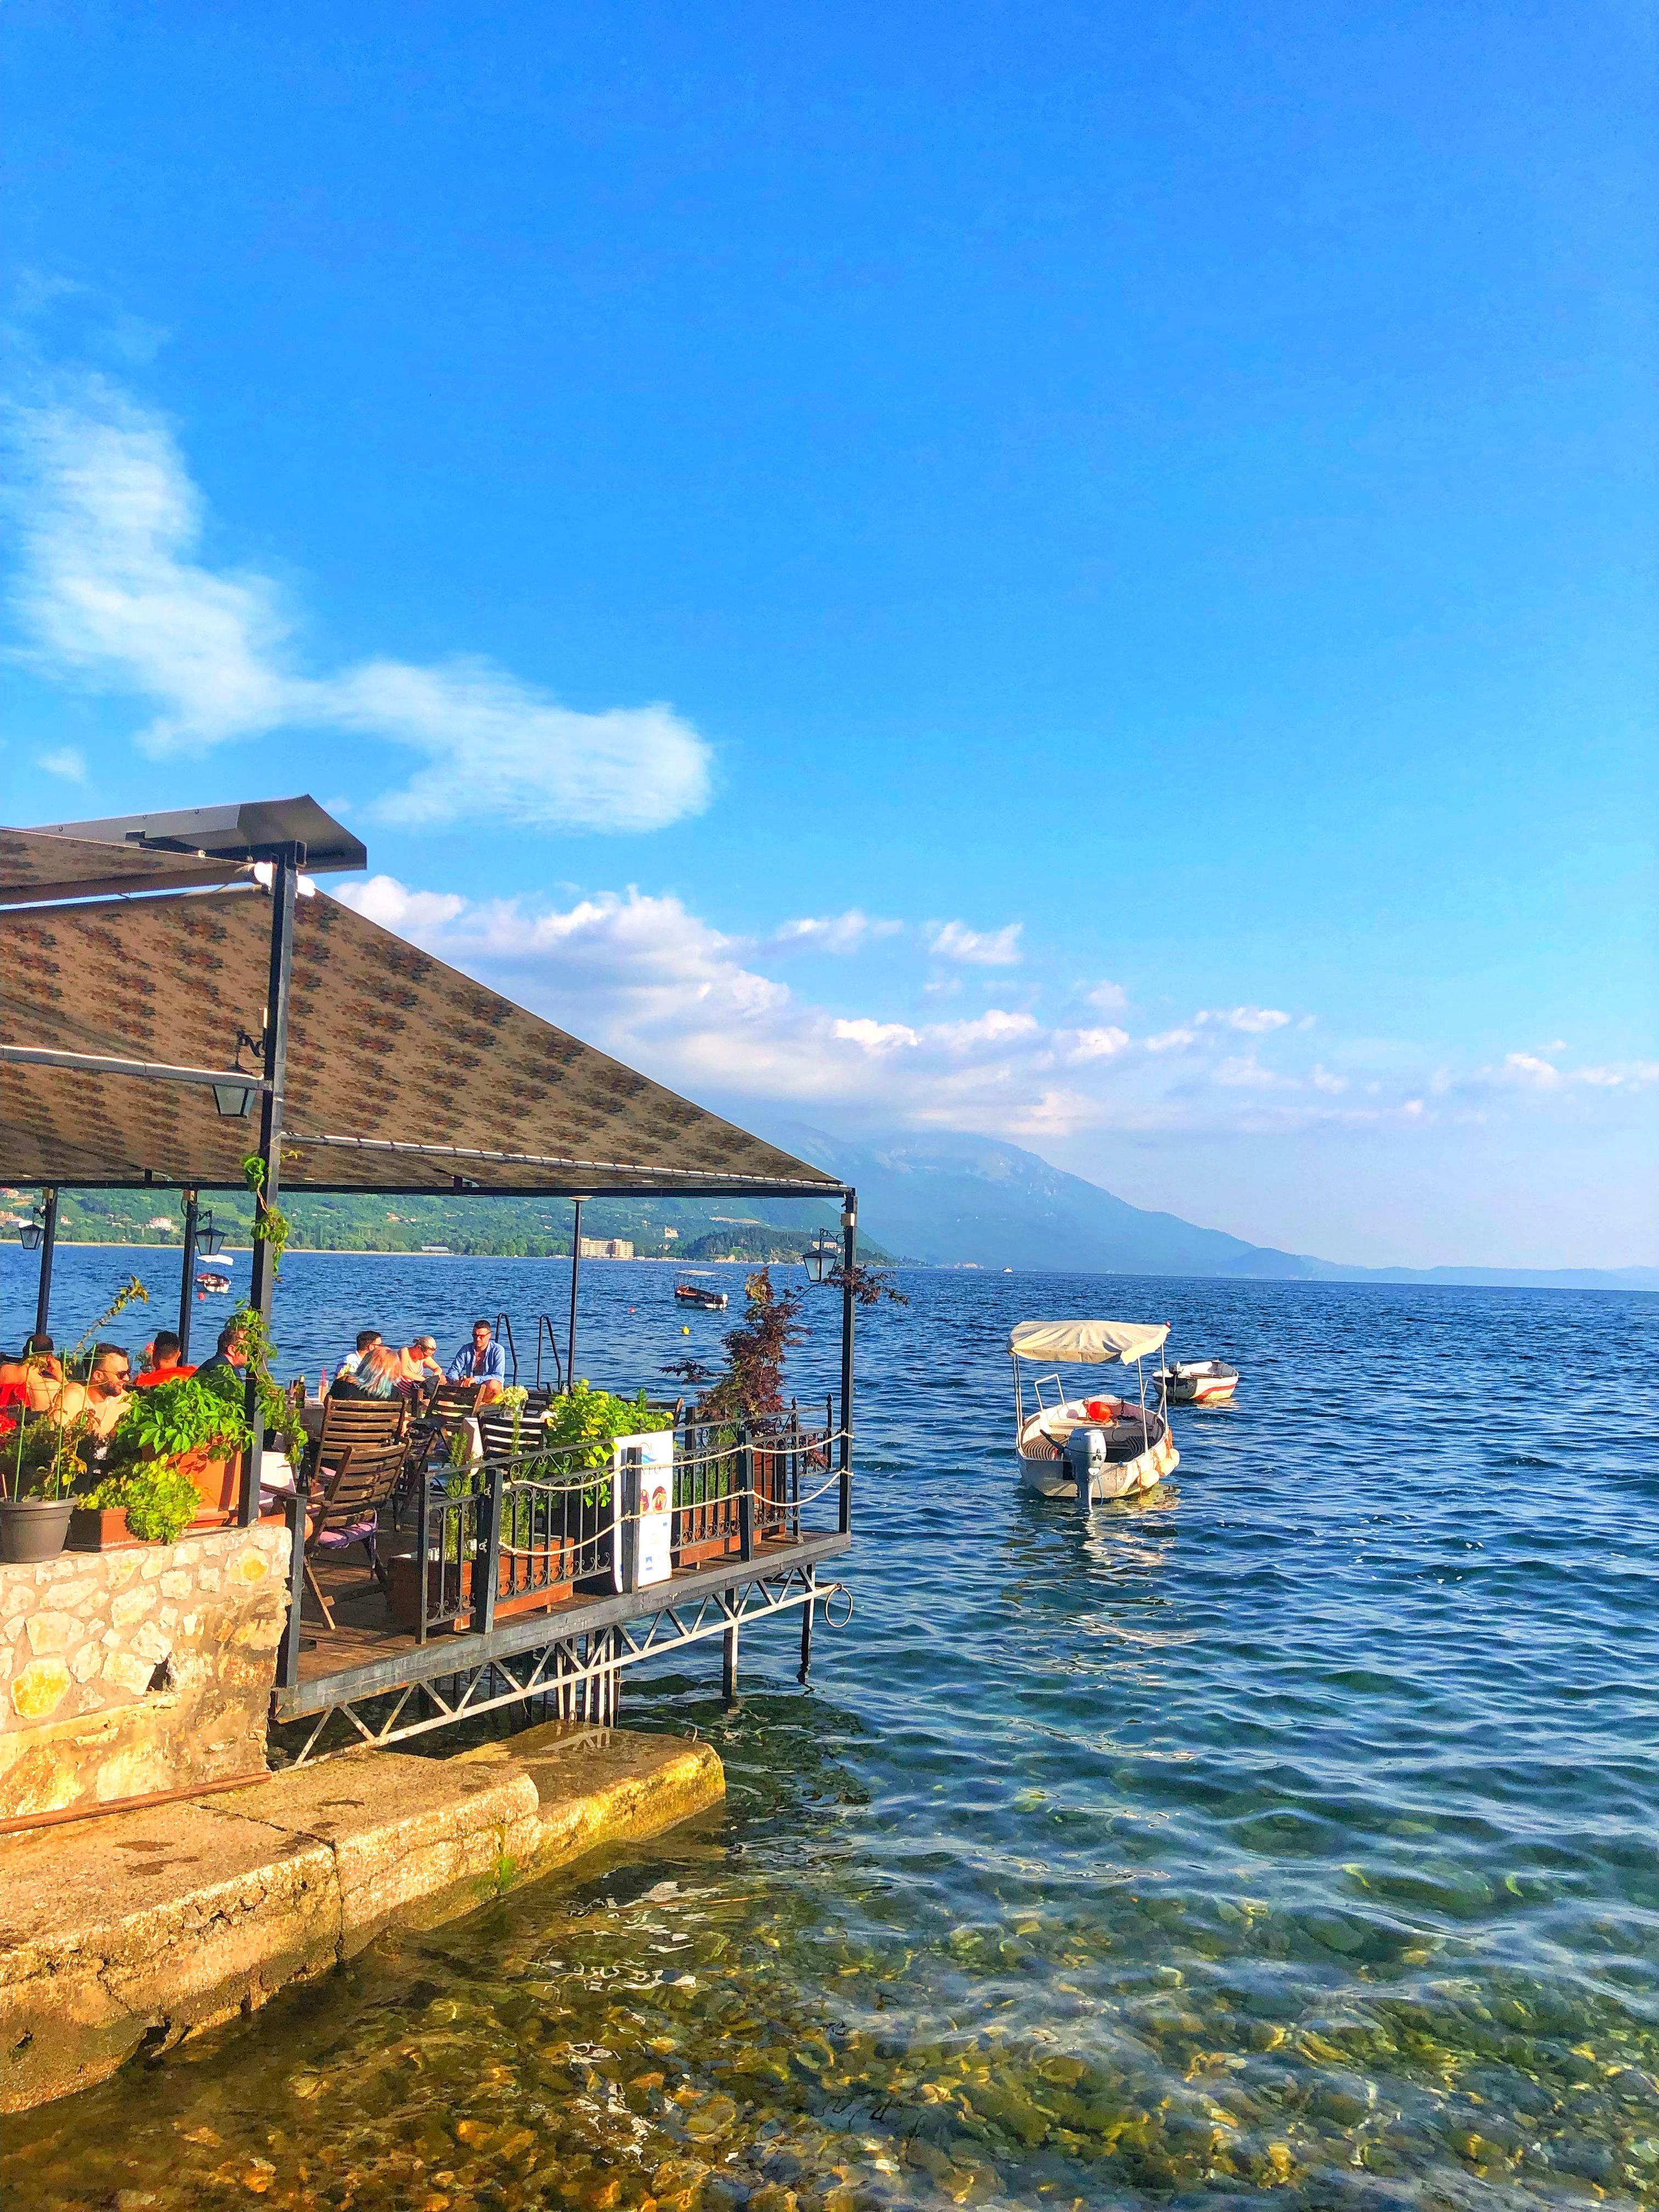 Restaurant Kaneo Meer Van Ohrid Macedonie Reistips Europa Rondreis